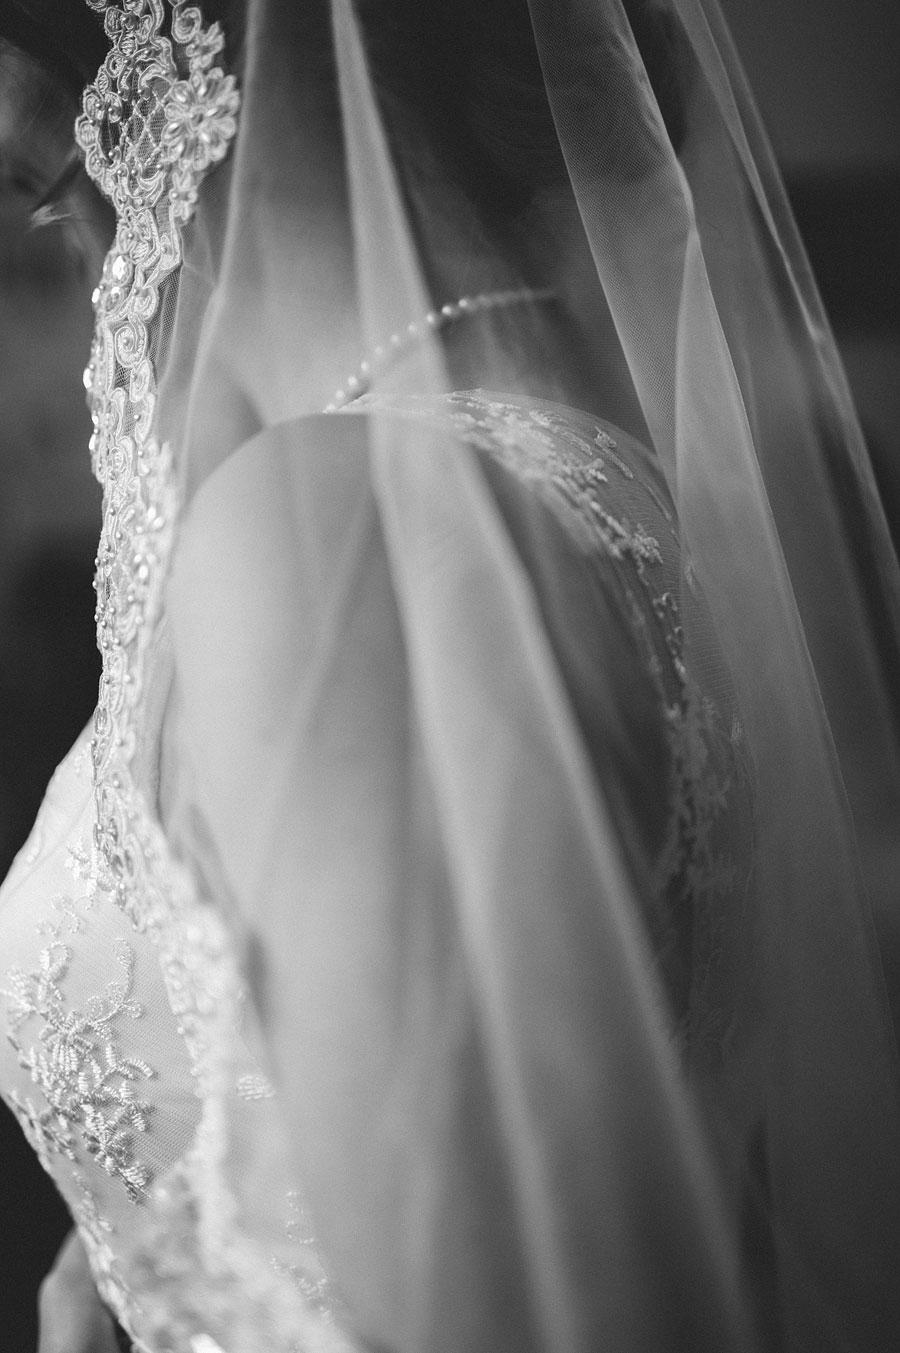 chapeloftheholydovewedding_by_theimageisfound_0014.jpg